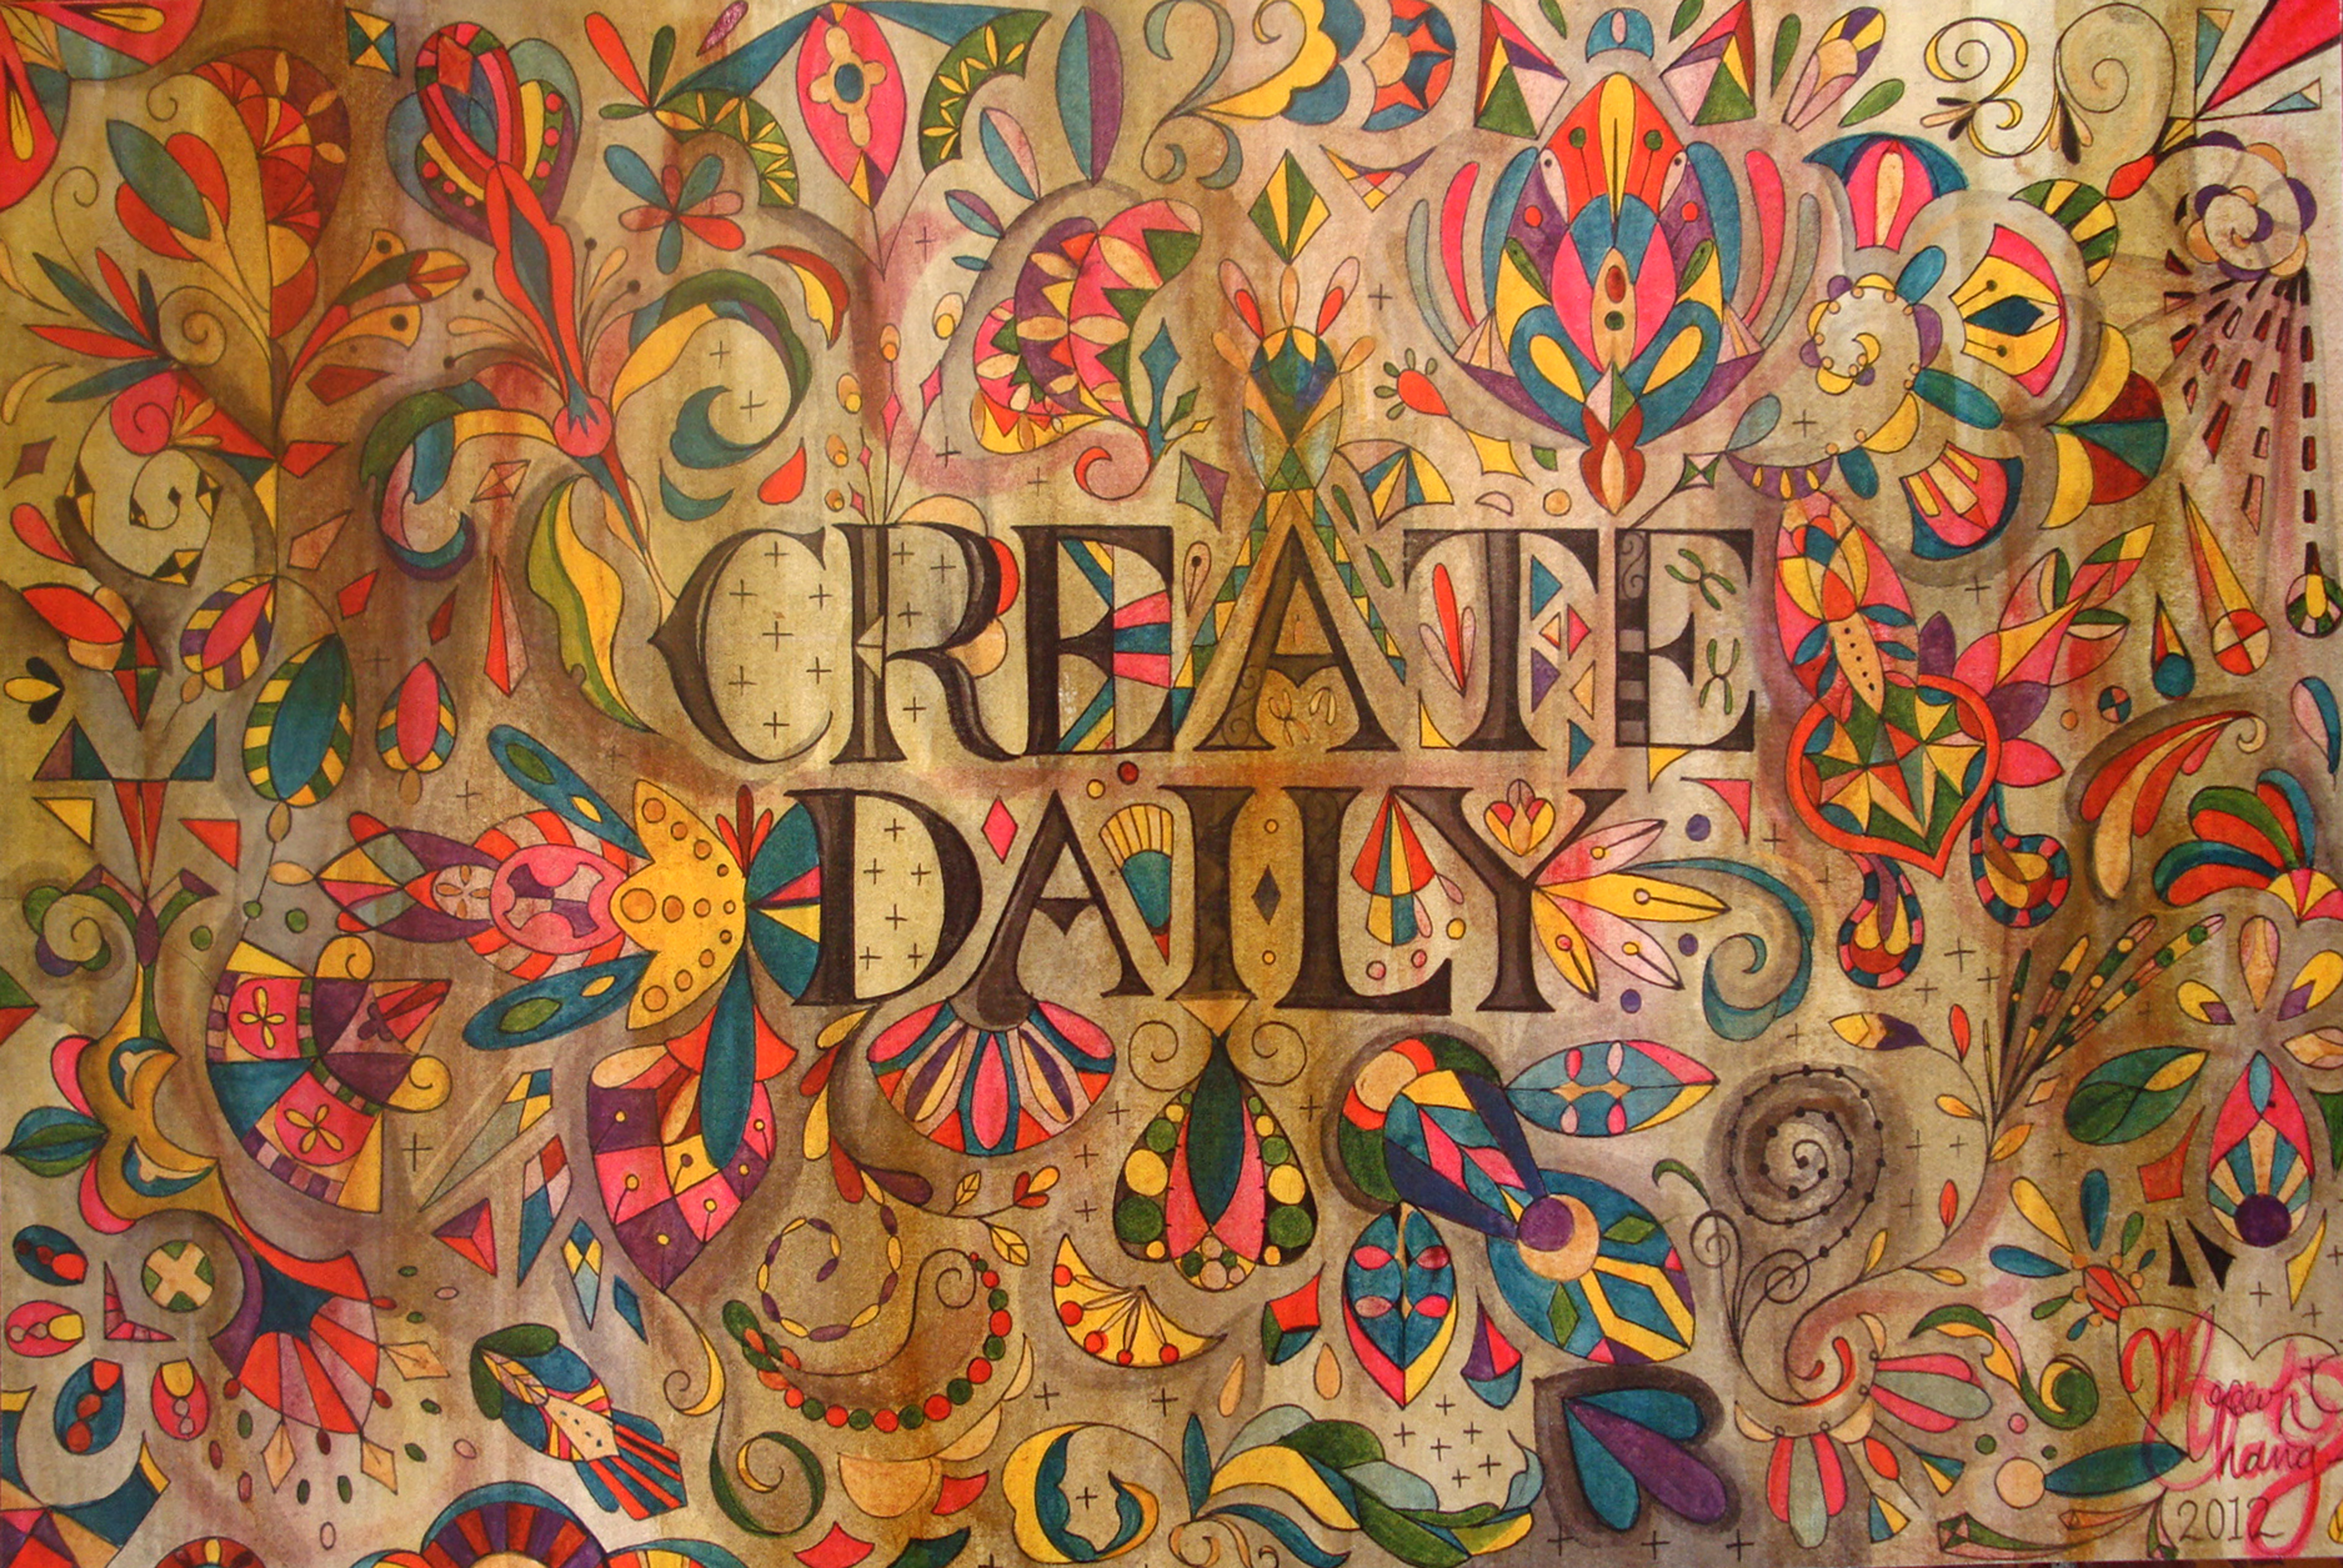 createdaily